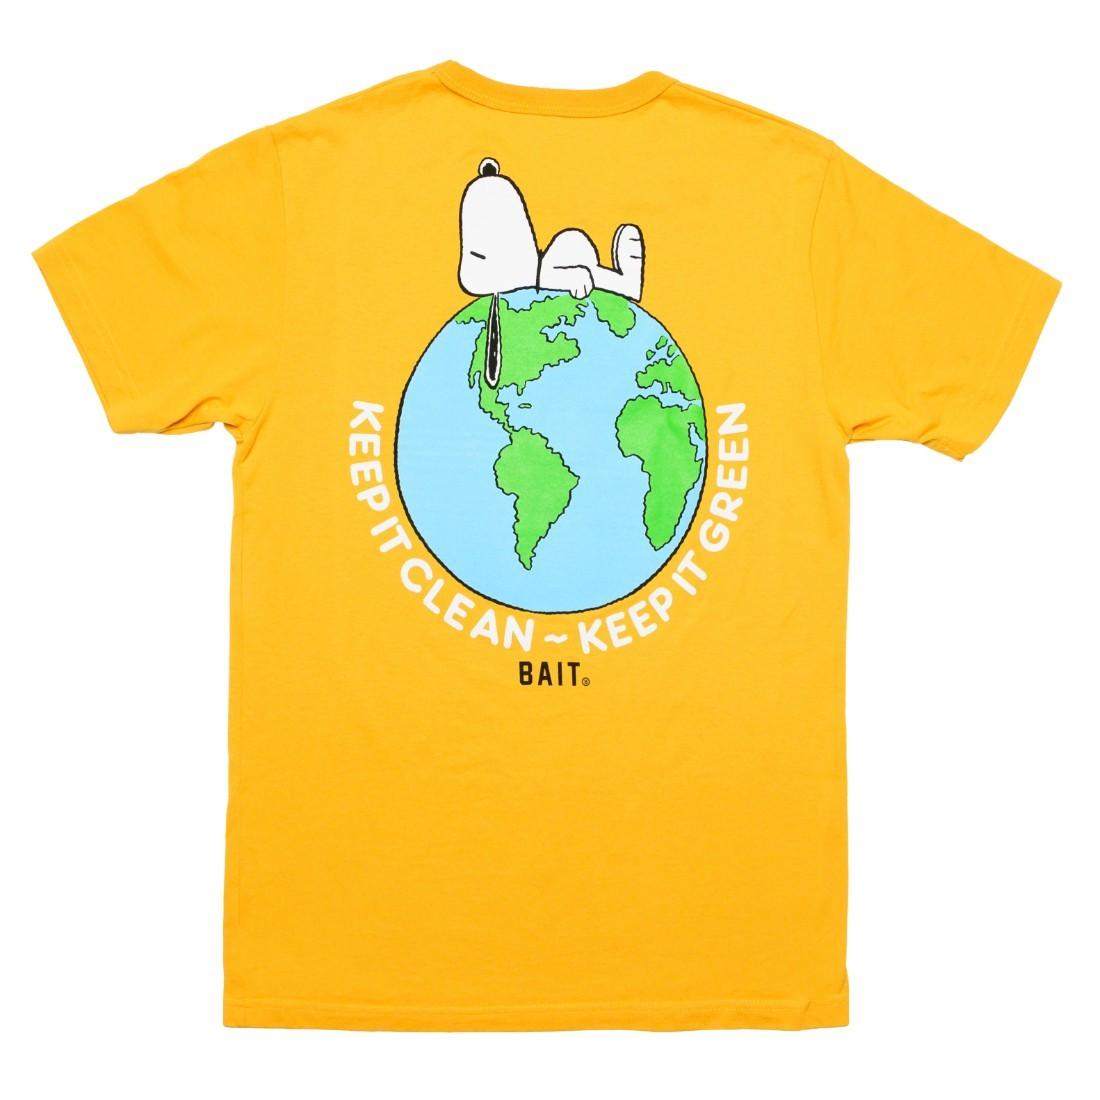 BAIT x Snoopy x Upcycle Men Our World Tee (yellow / mango)